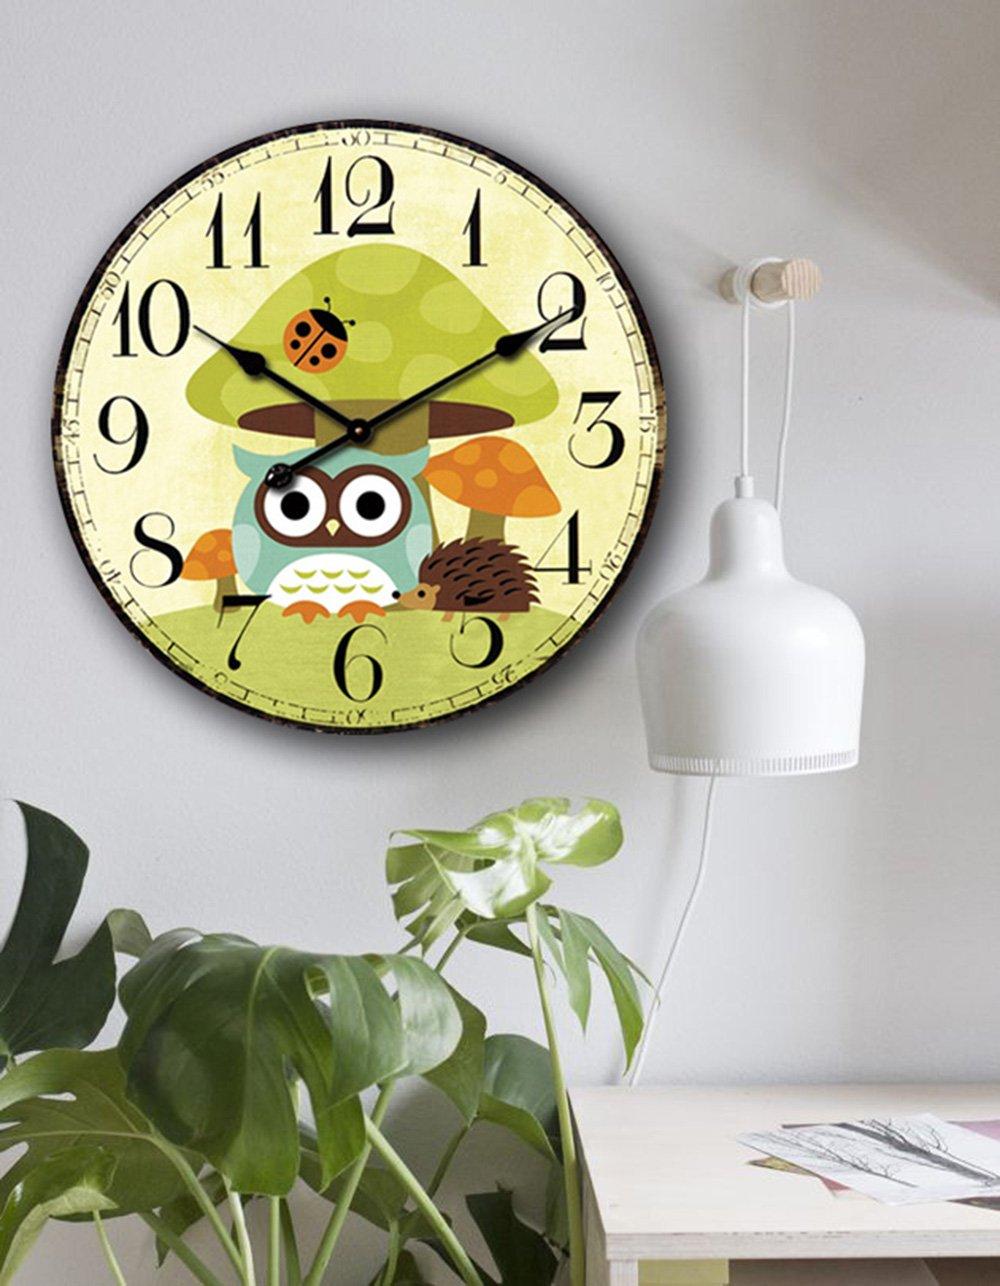 Amazon.com: Eruner 14-inch Vintage Wood Wall Clock - Colorful Ocean ...